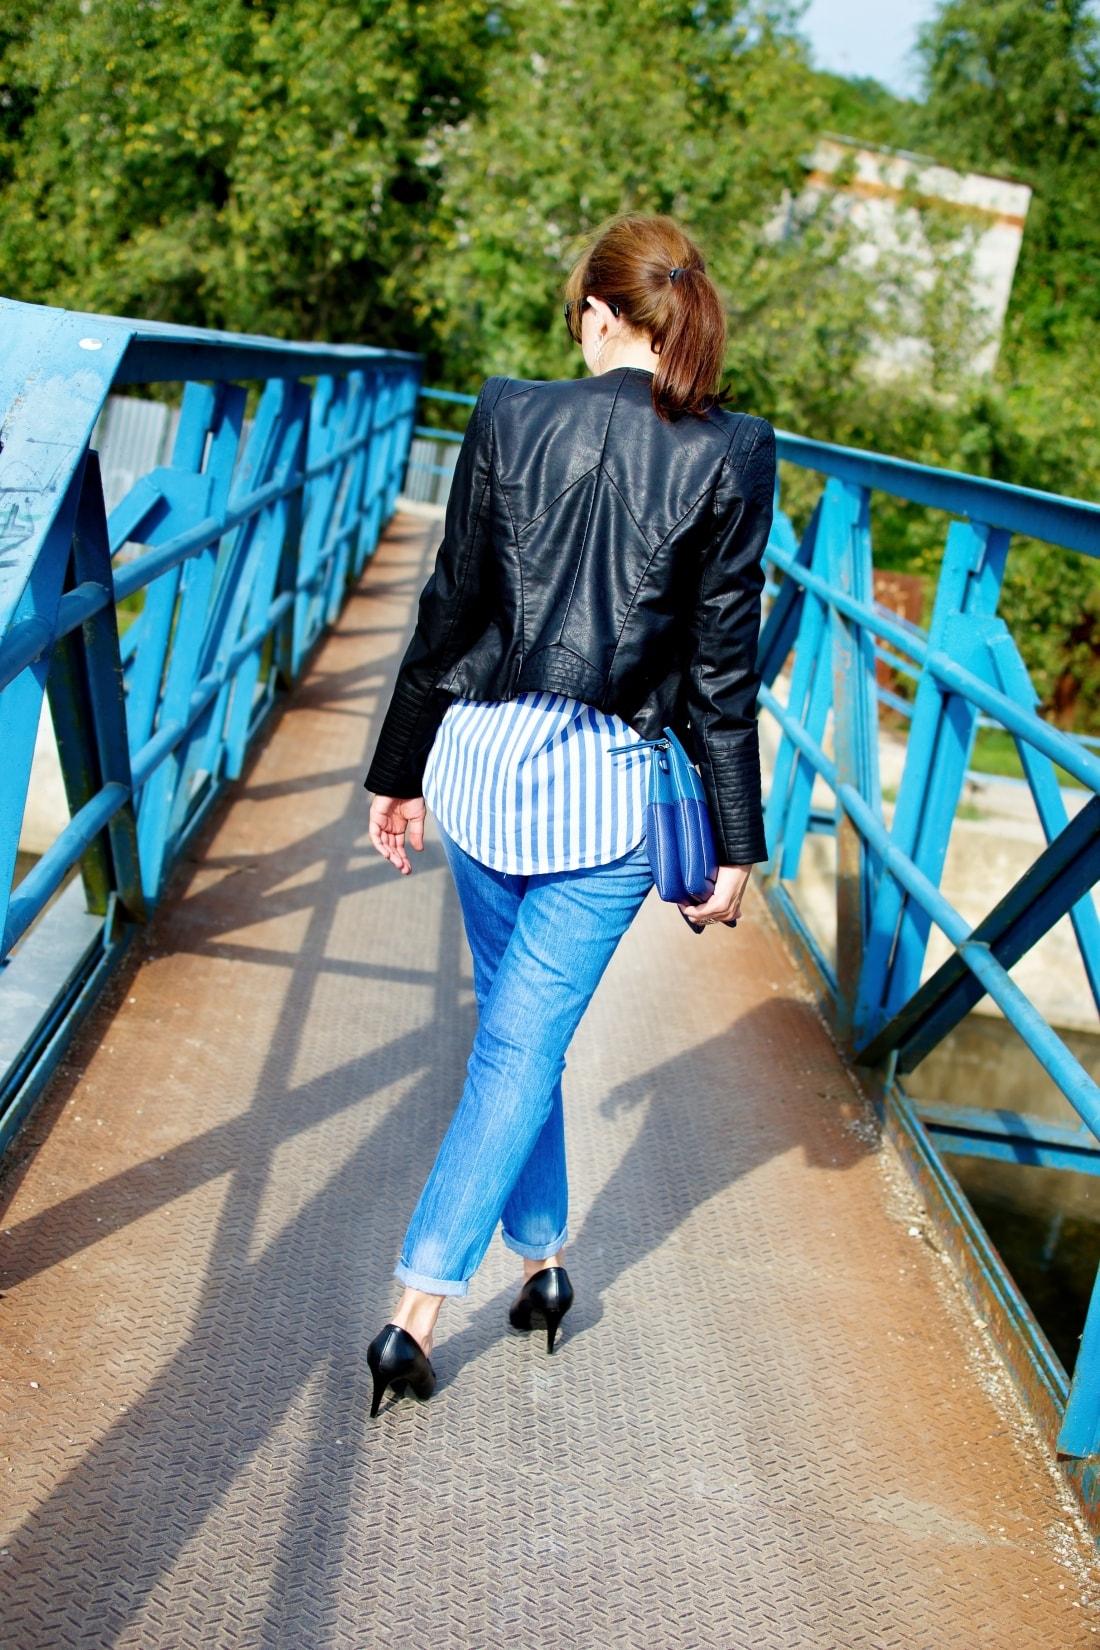 Move, move, move_Katharine-fashion is beautiful_6_Blog_Kožená bunda_Roztrhané džínsy_Prúžkovaná blúzka_Kabelka Parfois_Katarína Jakubčová_Fashion blogger